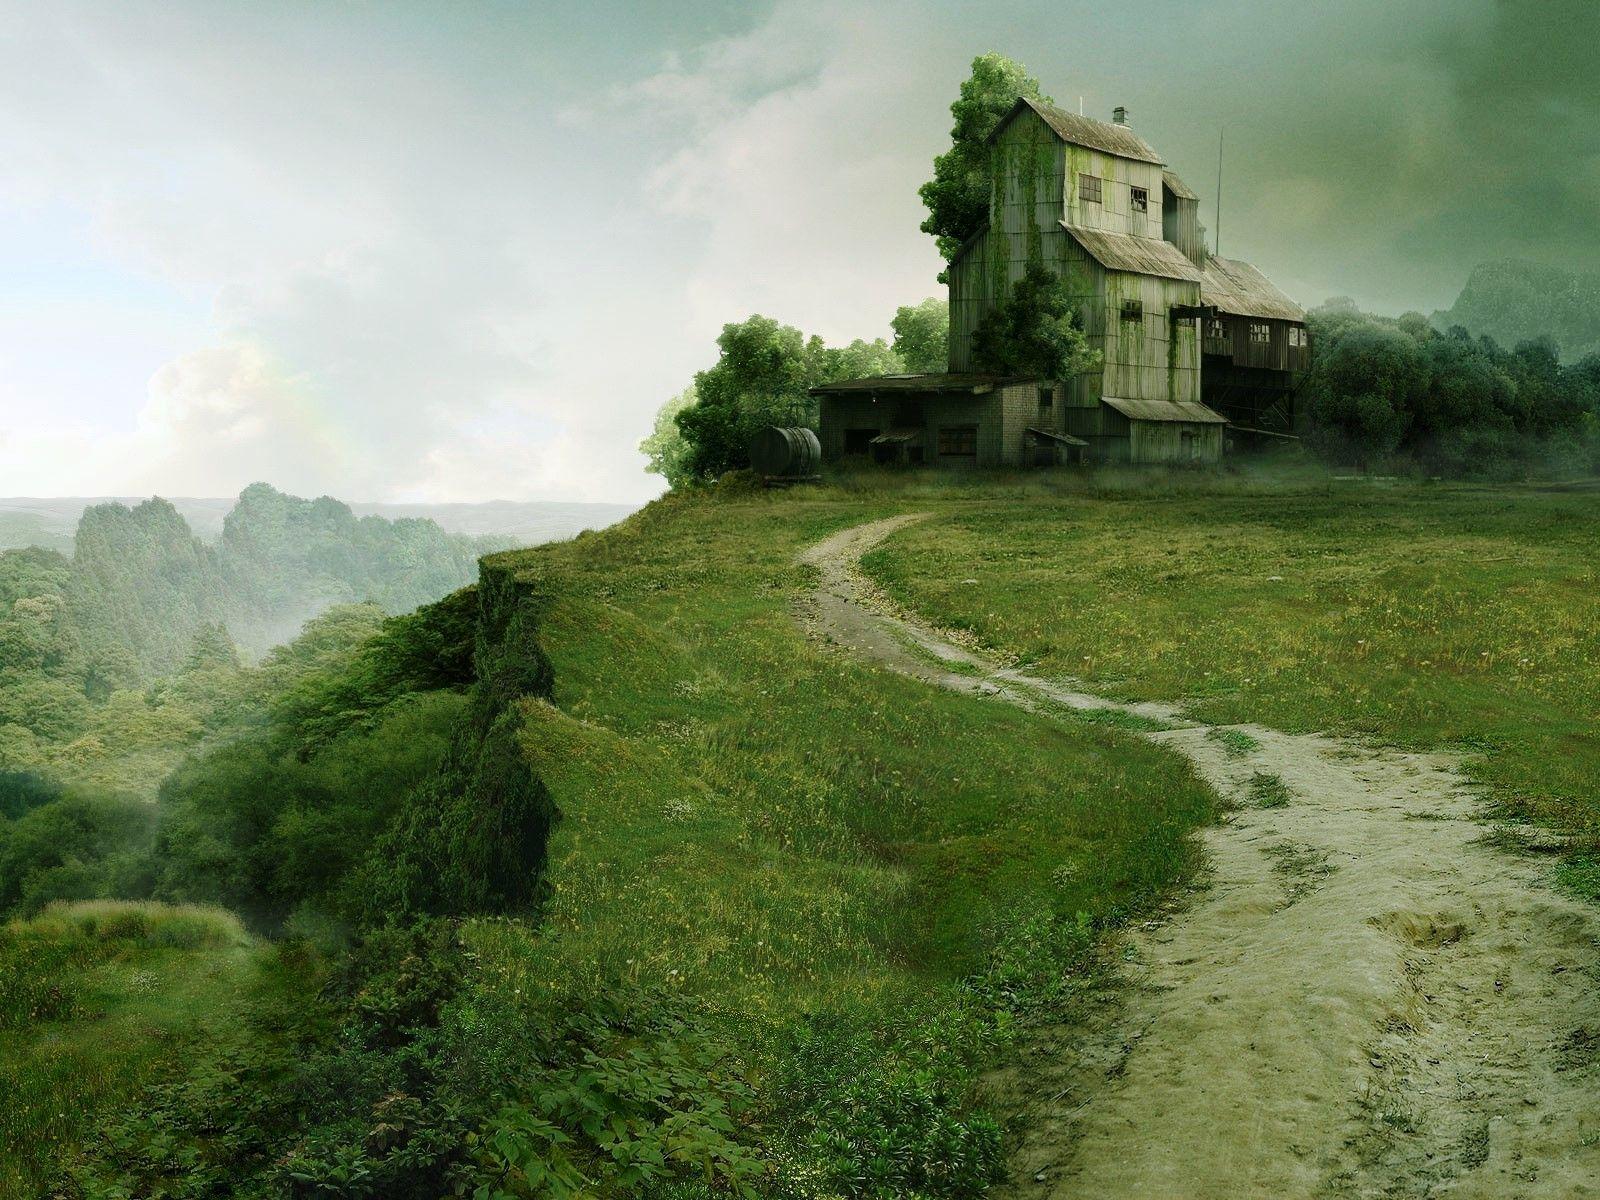 amazing beautiful nature landscape photo for desktop background